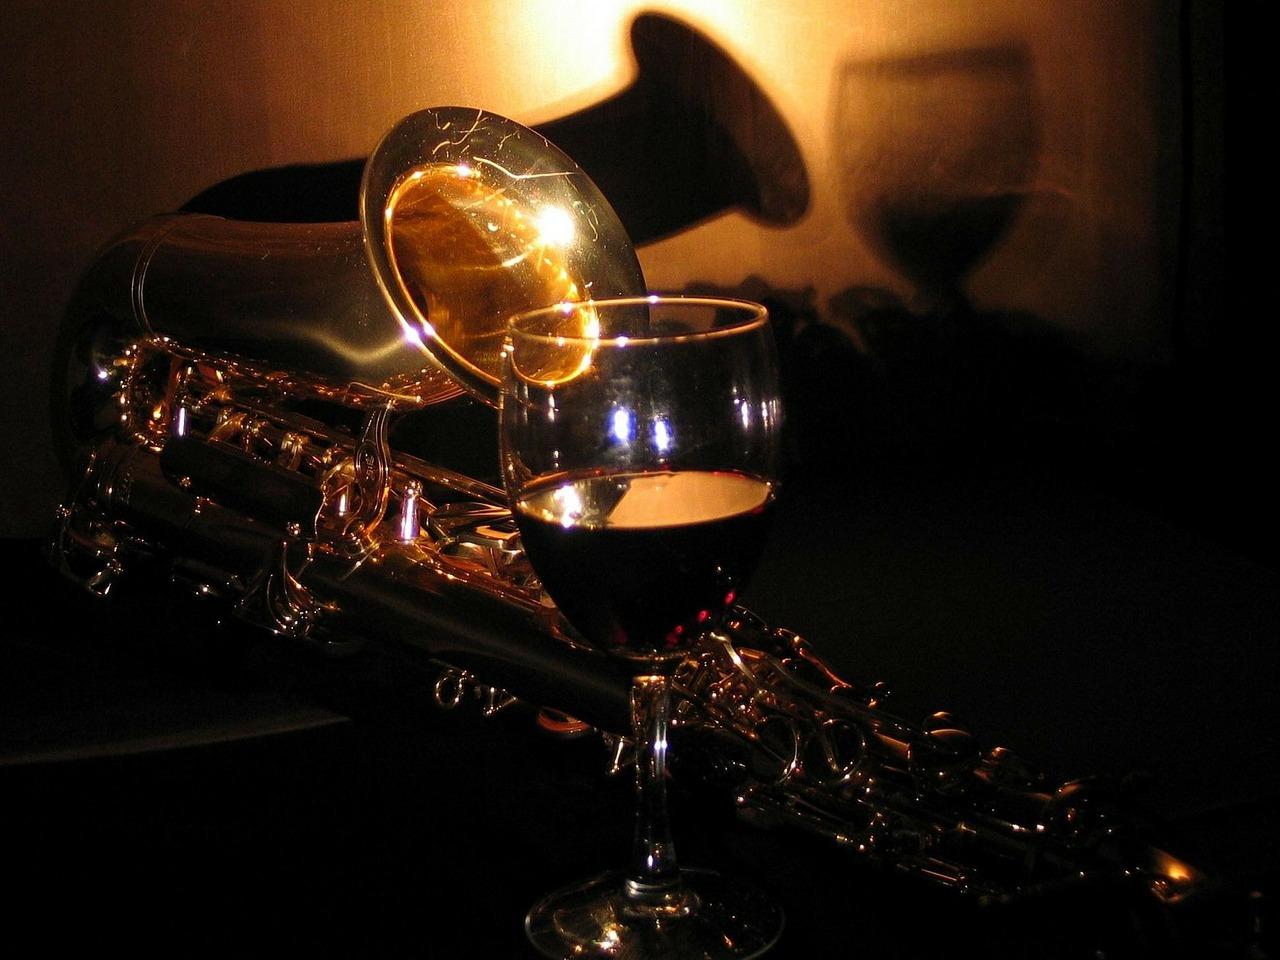 Status społeczny, a problem z alkoholem